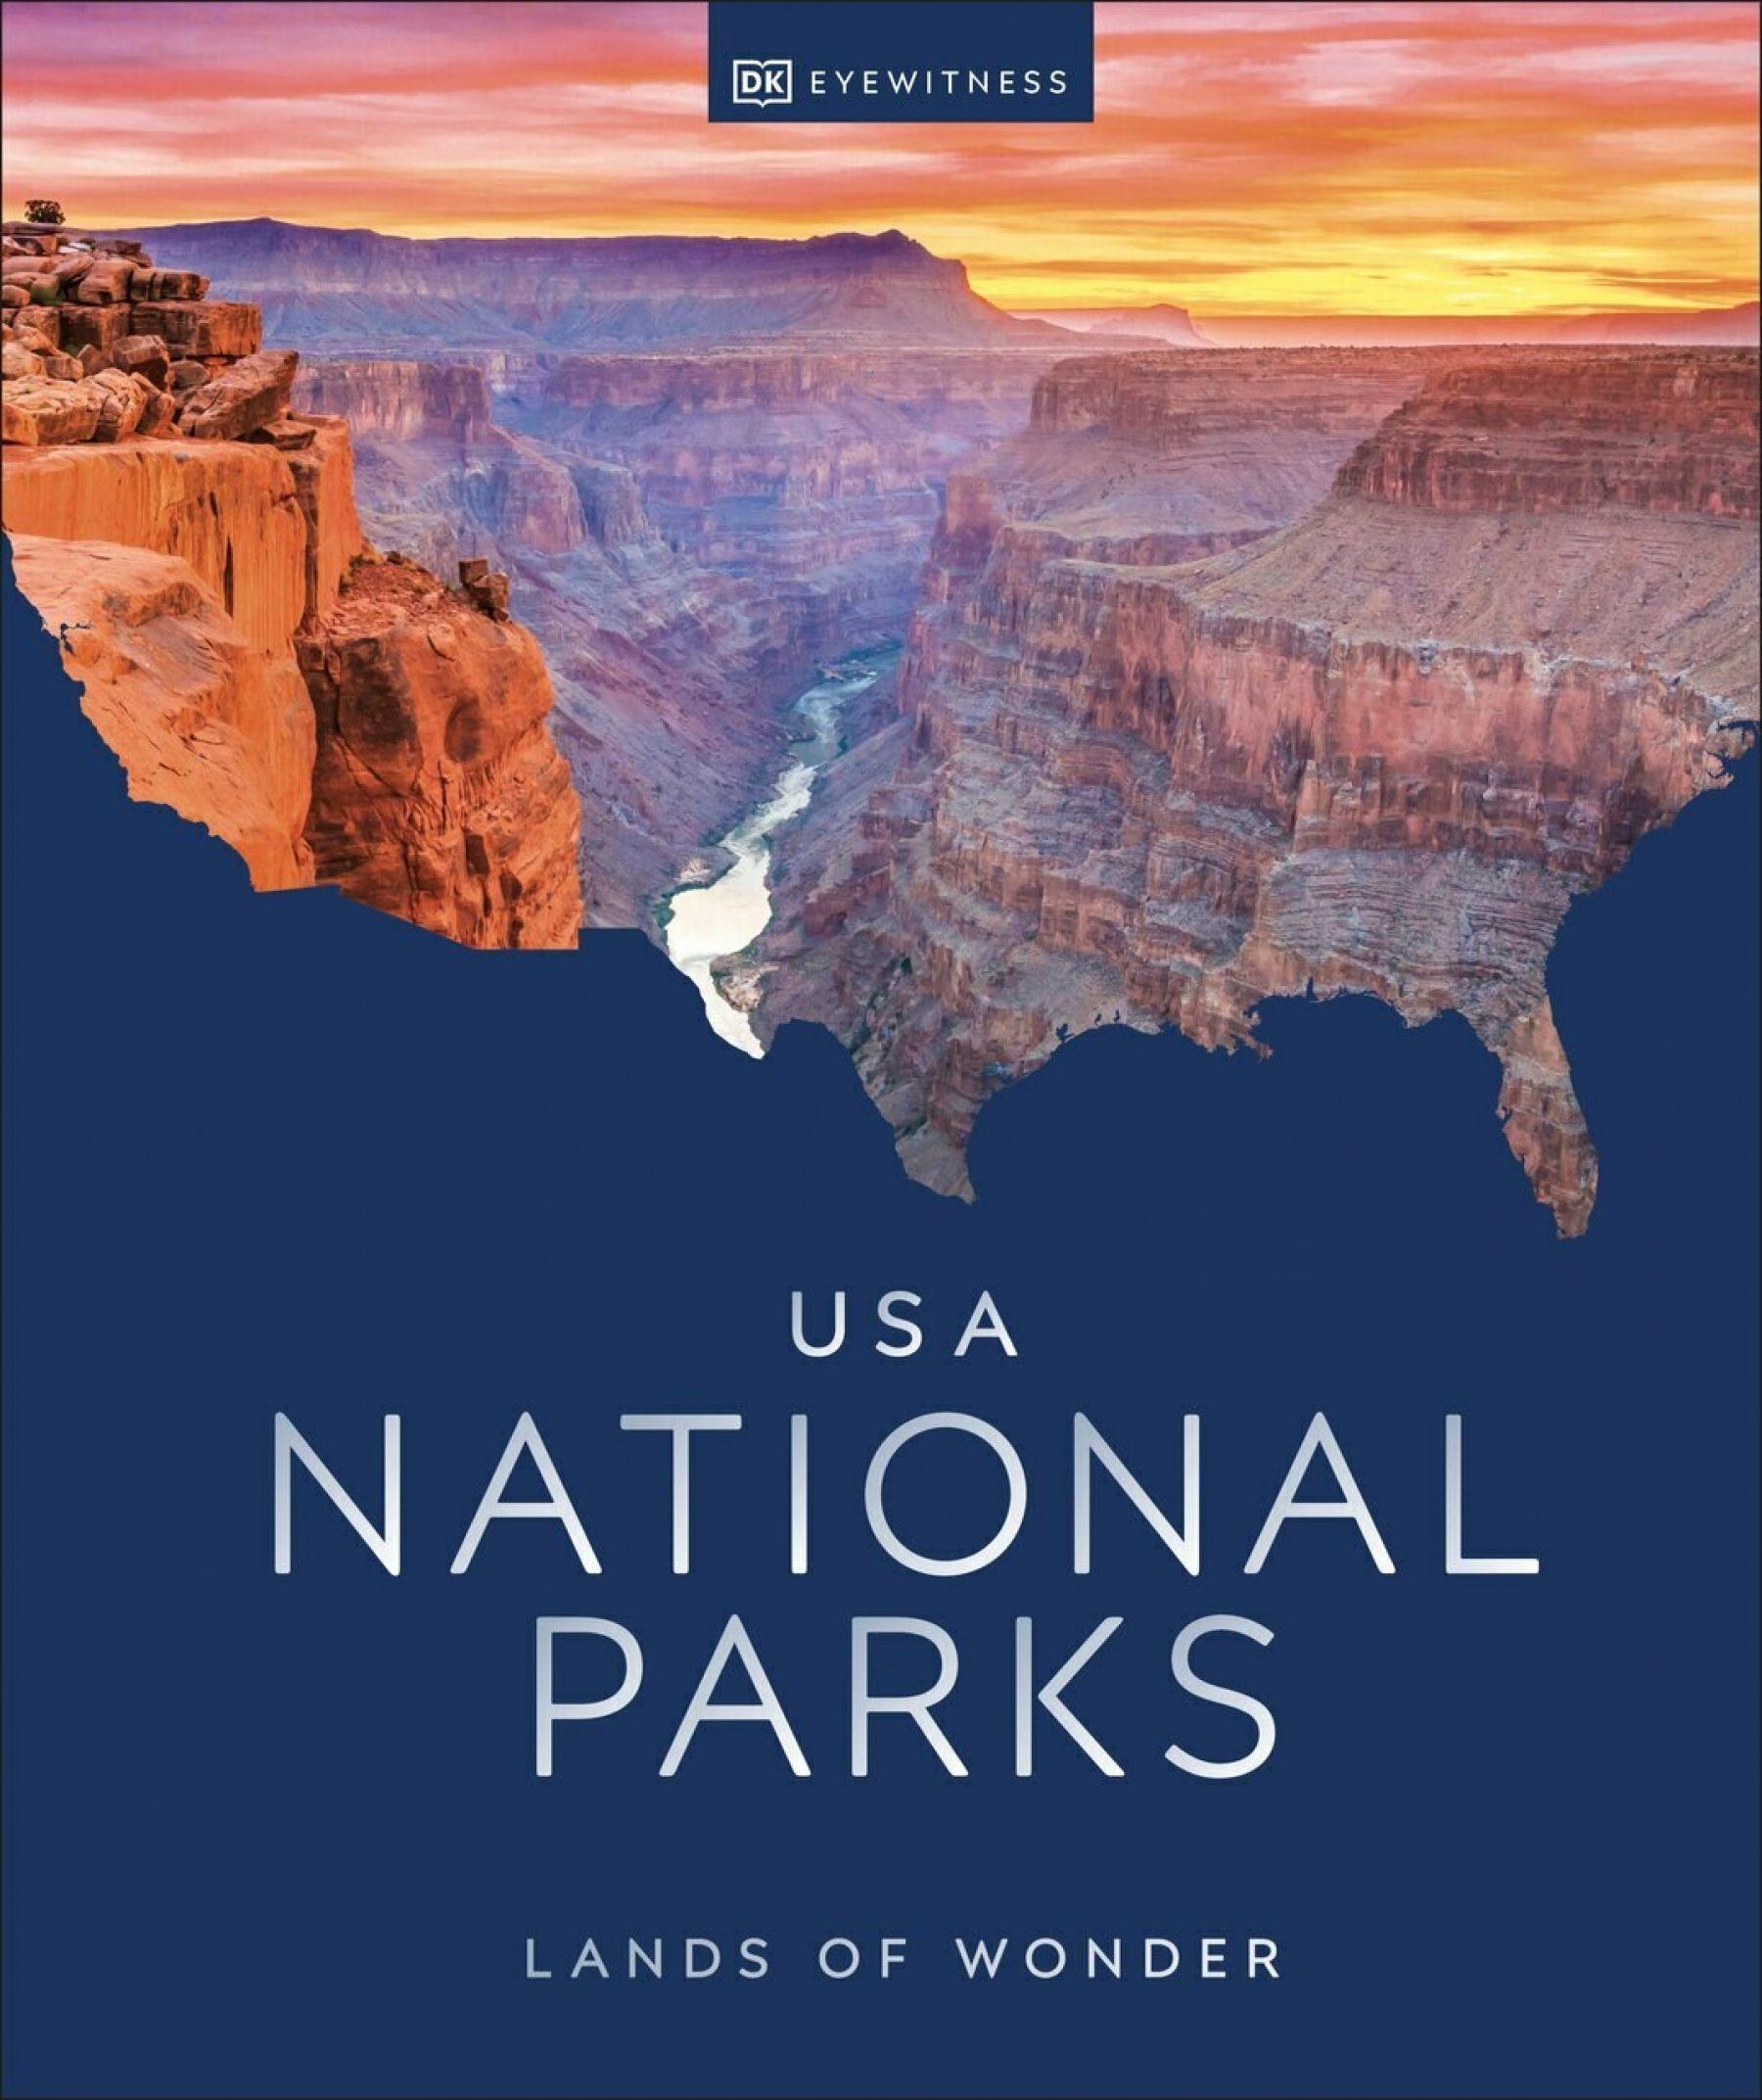 USA National Parks 9780744024494